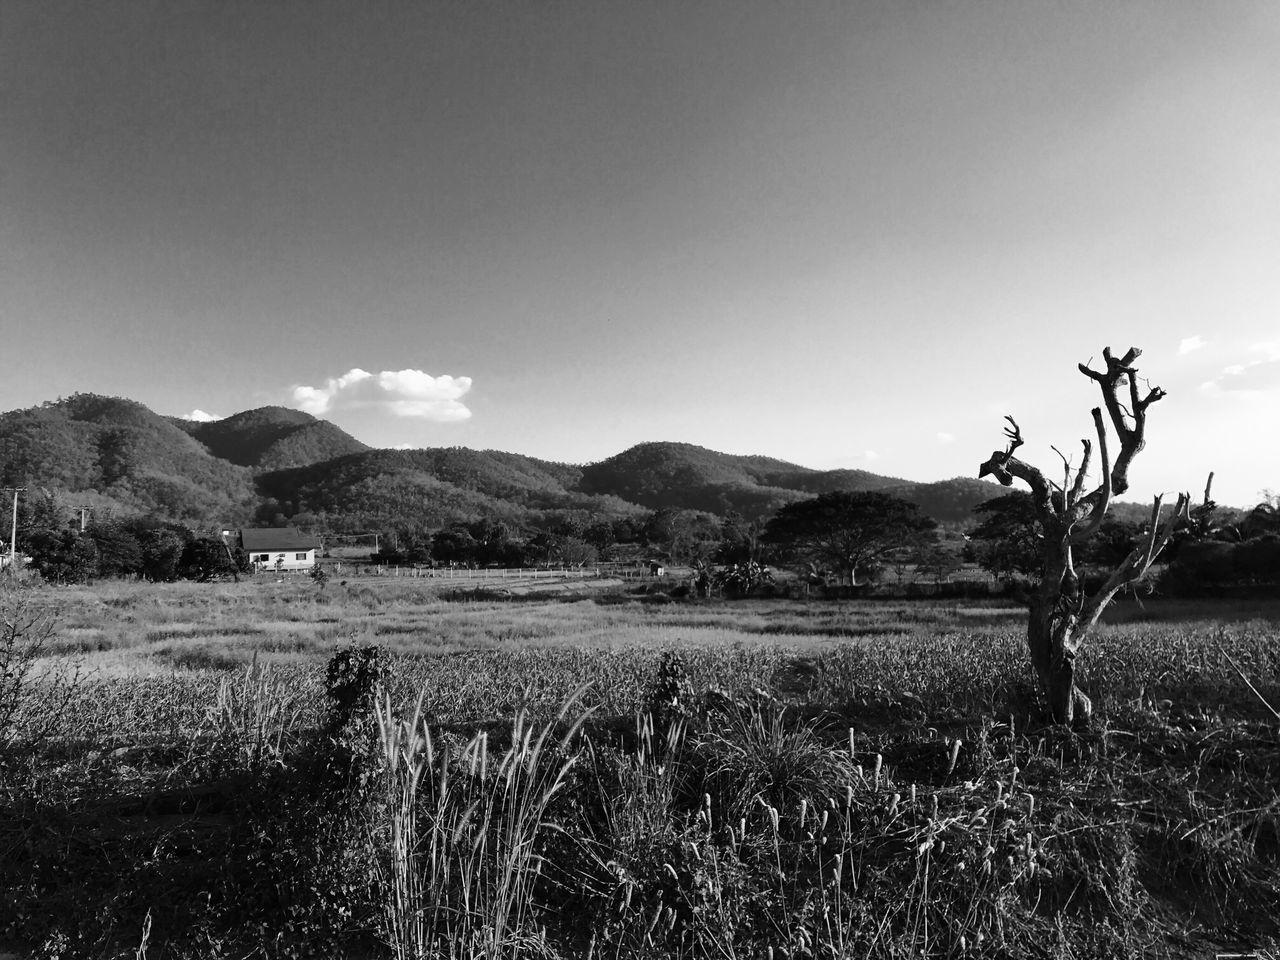 Landscape Blackandwhite Mountain Farm Pai